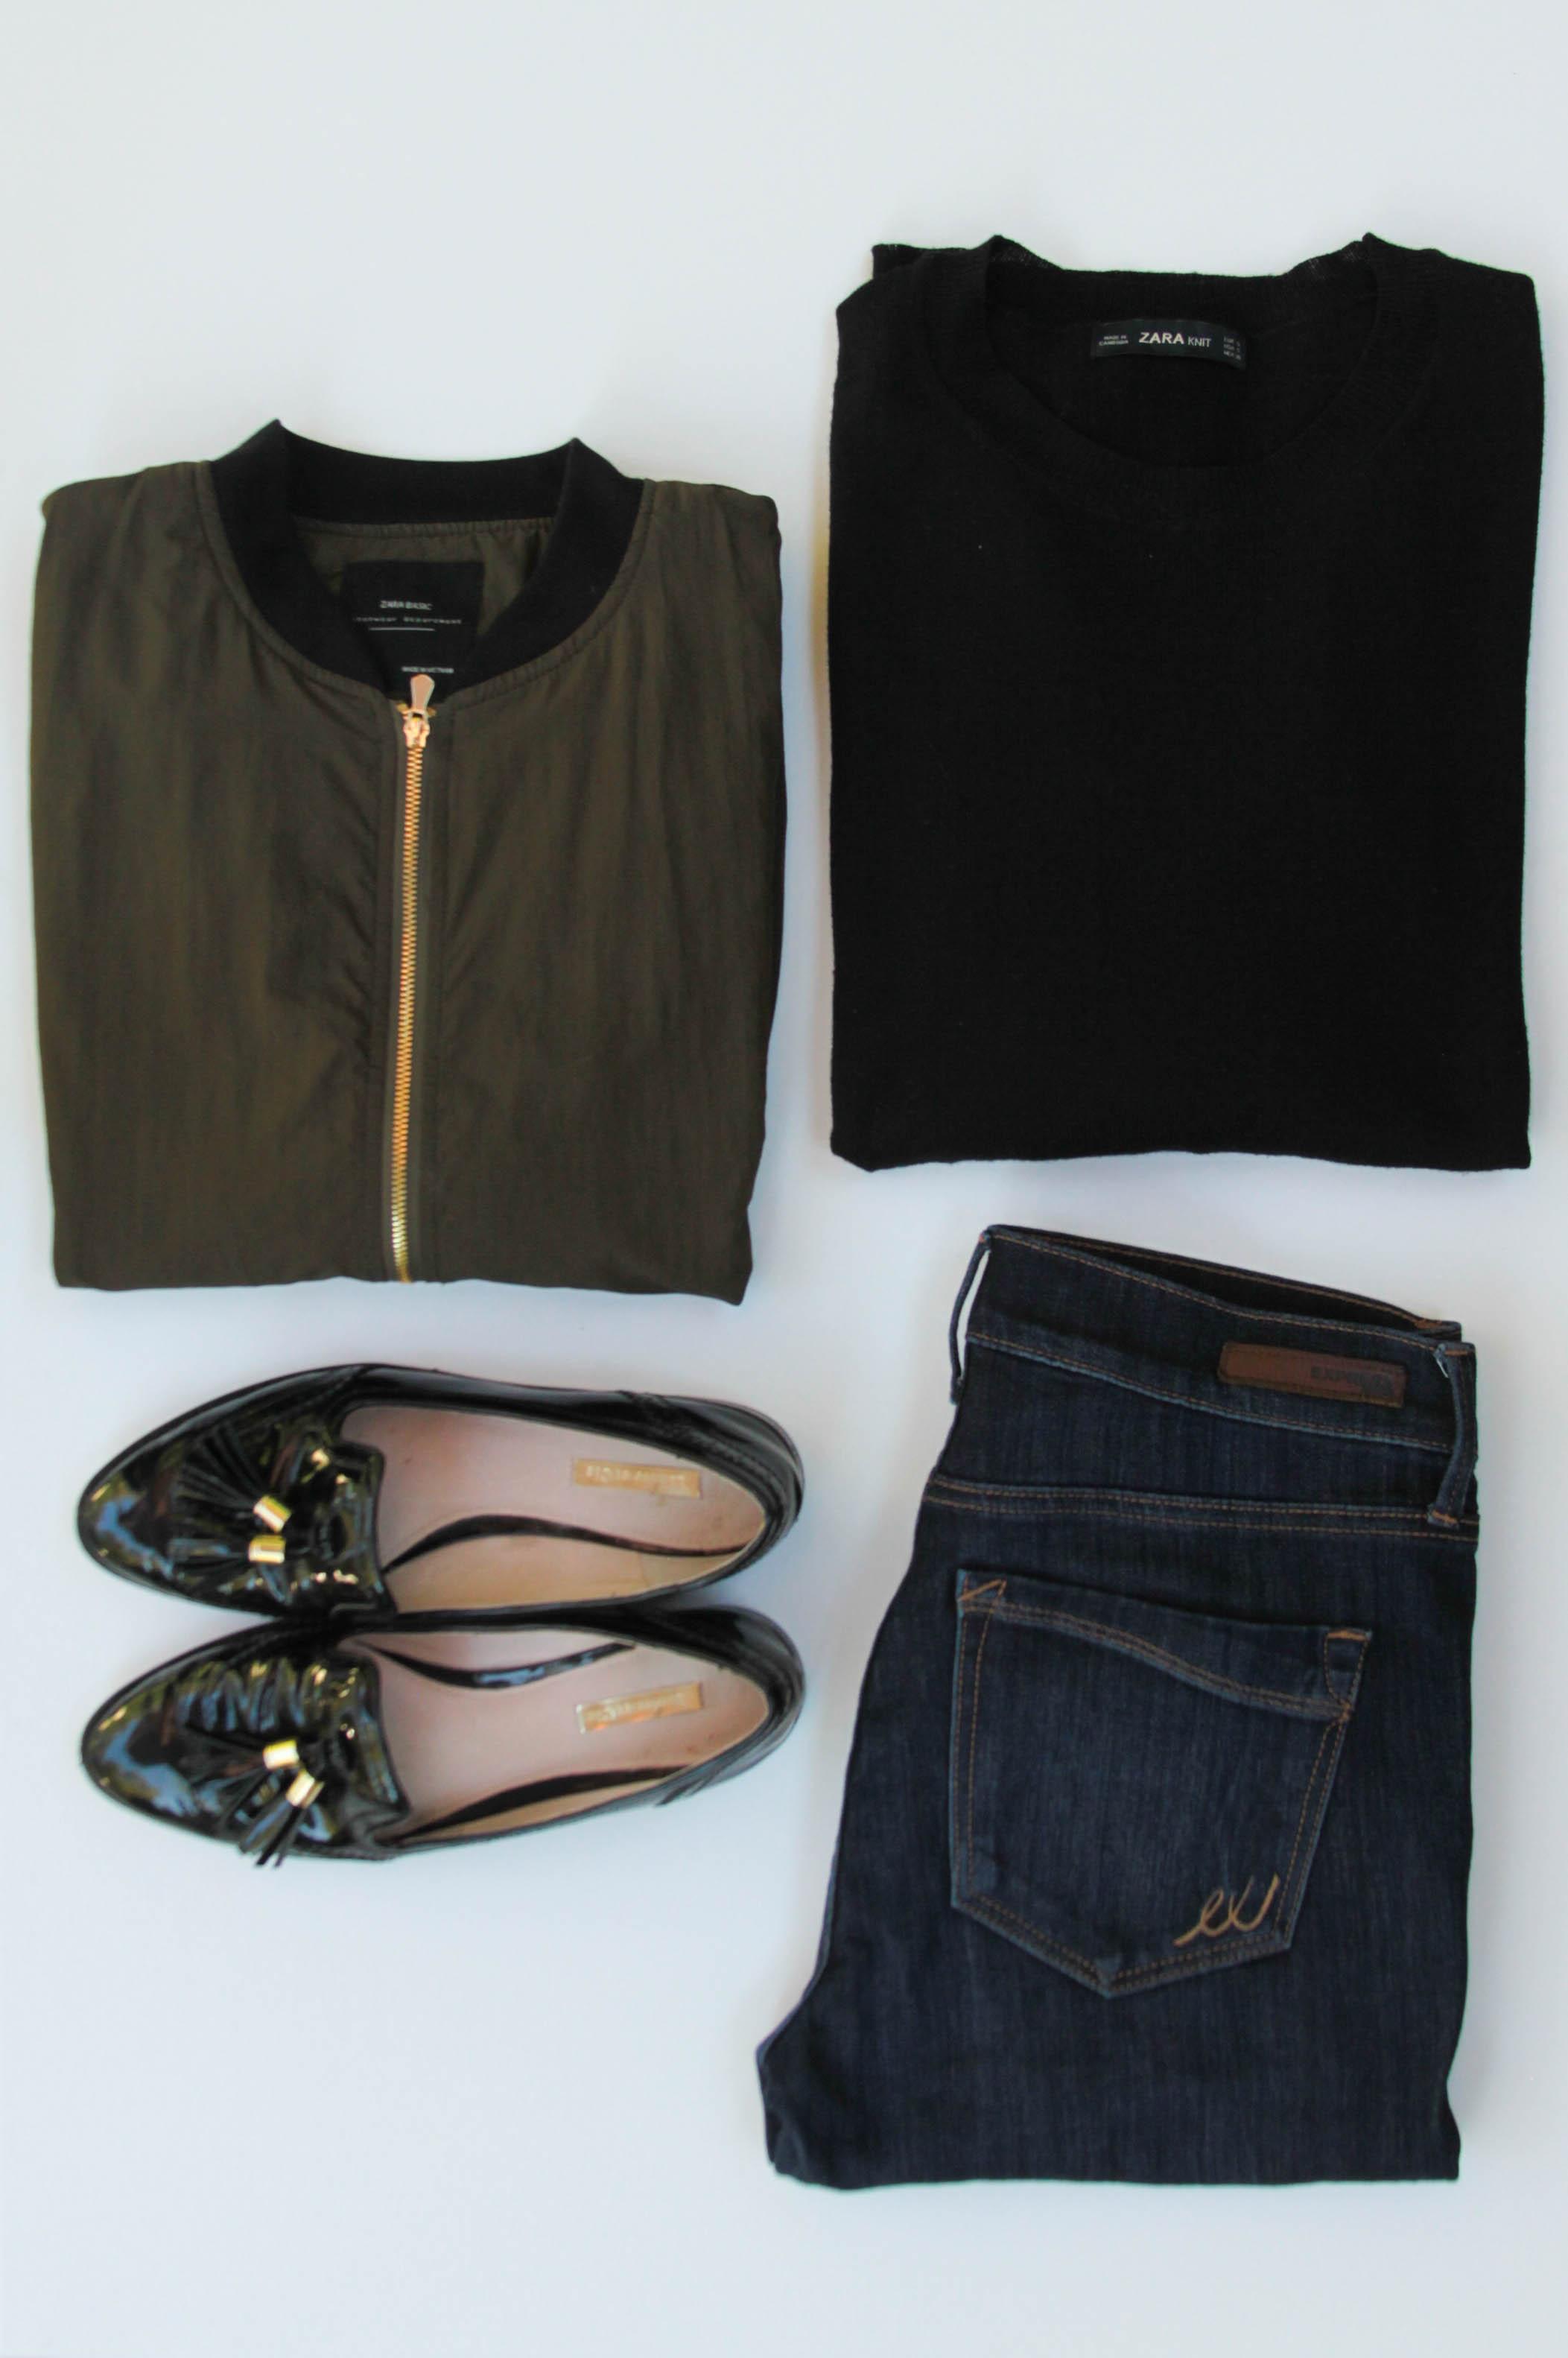 Zara Bomber Jacket ( Similar ) | Zara Black Sweater ( Similar ) |  Express Jeans  | Patent Leather Loafers ( Similar )